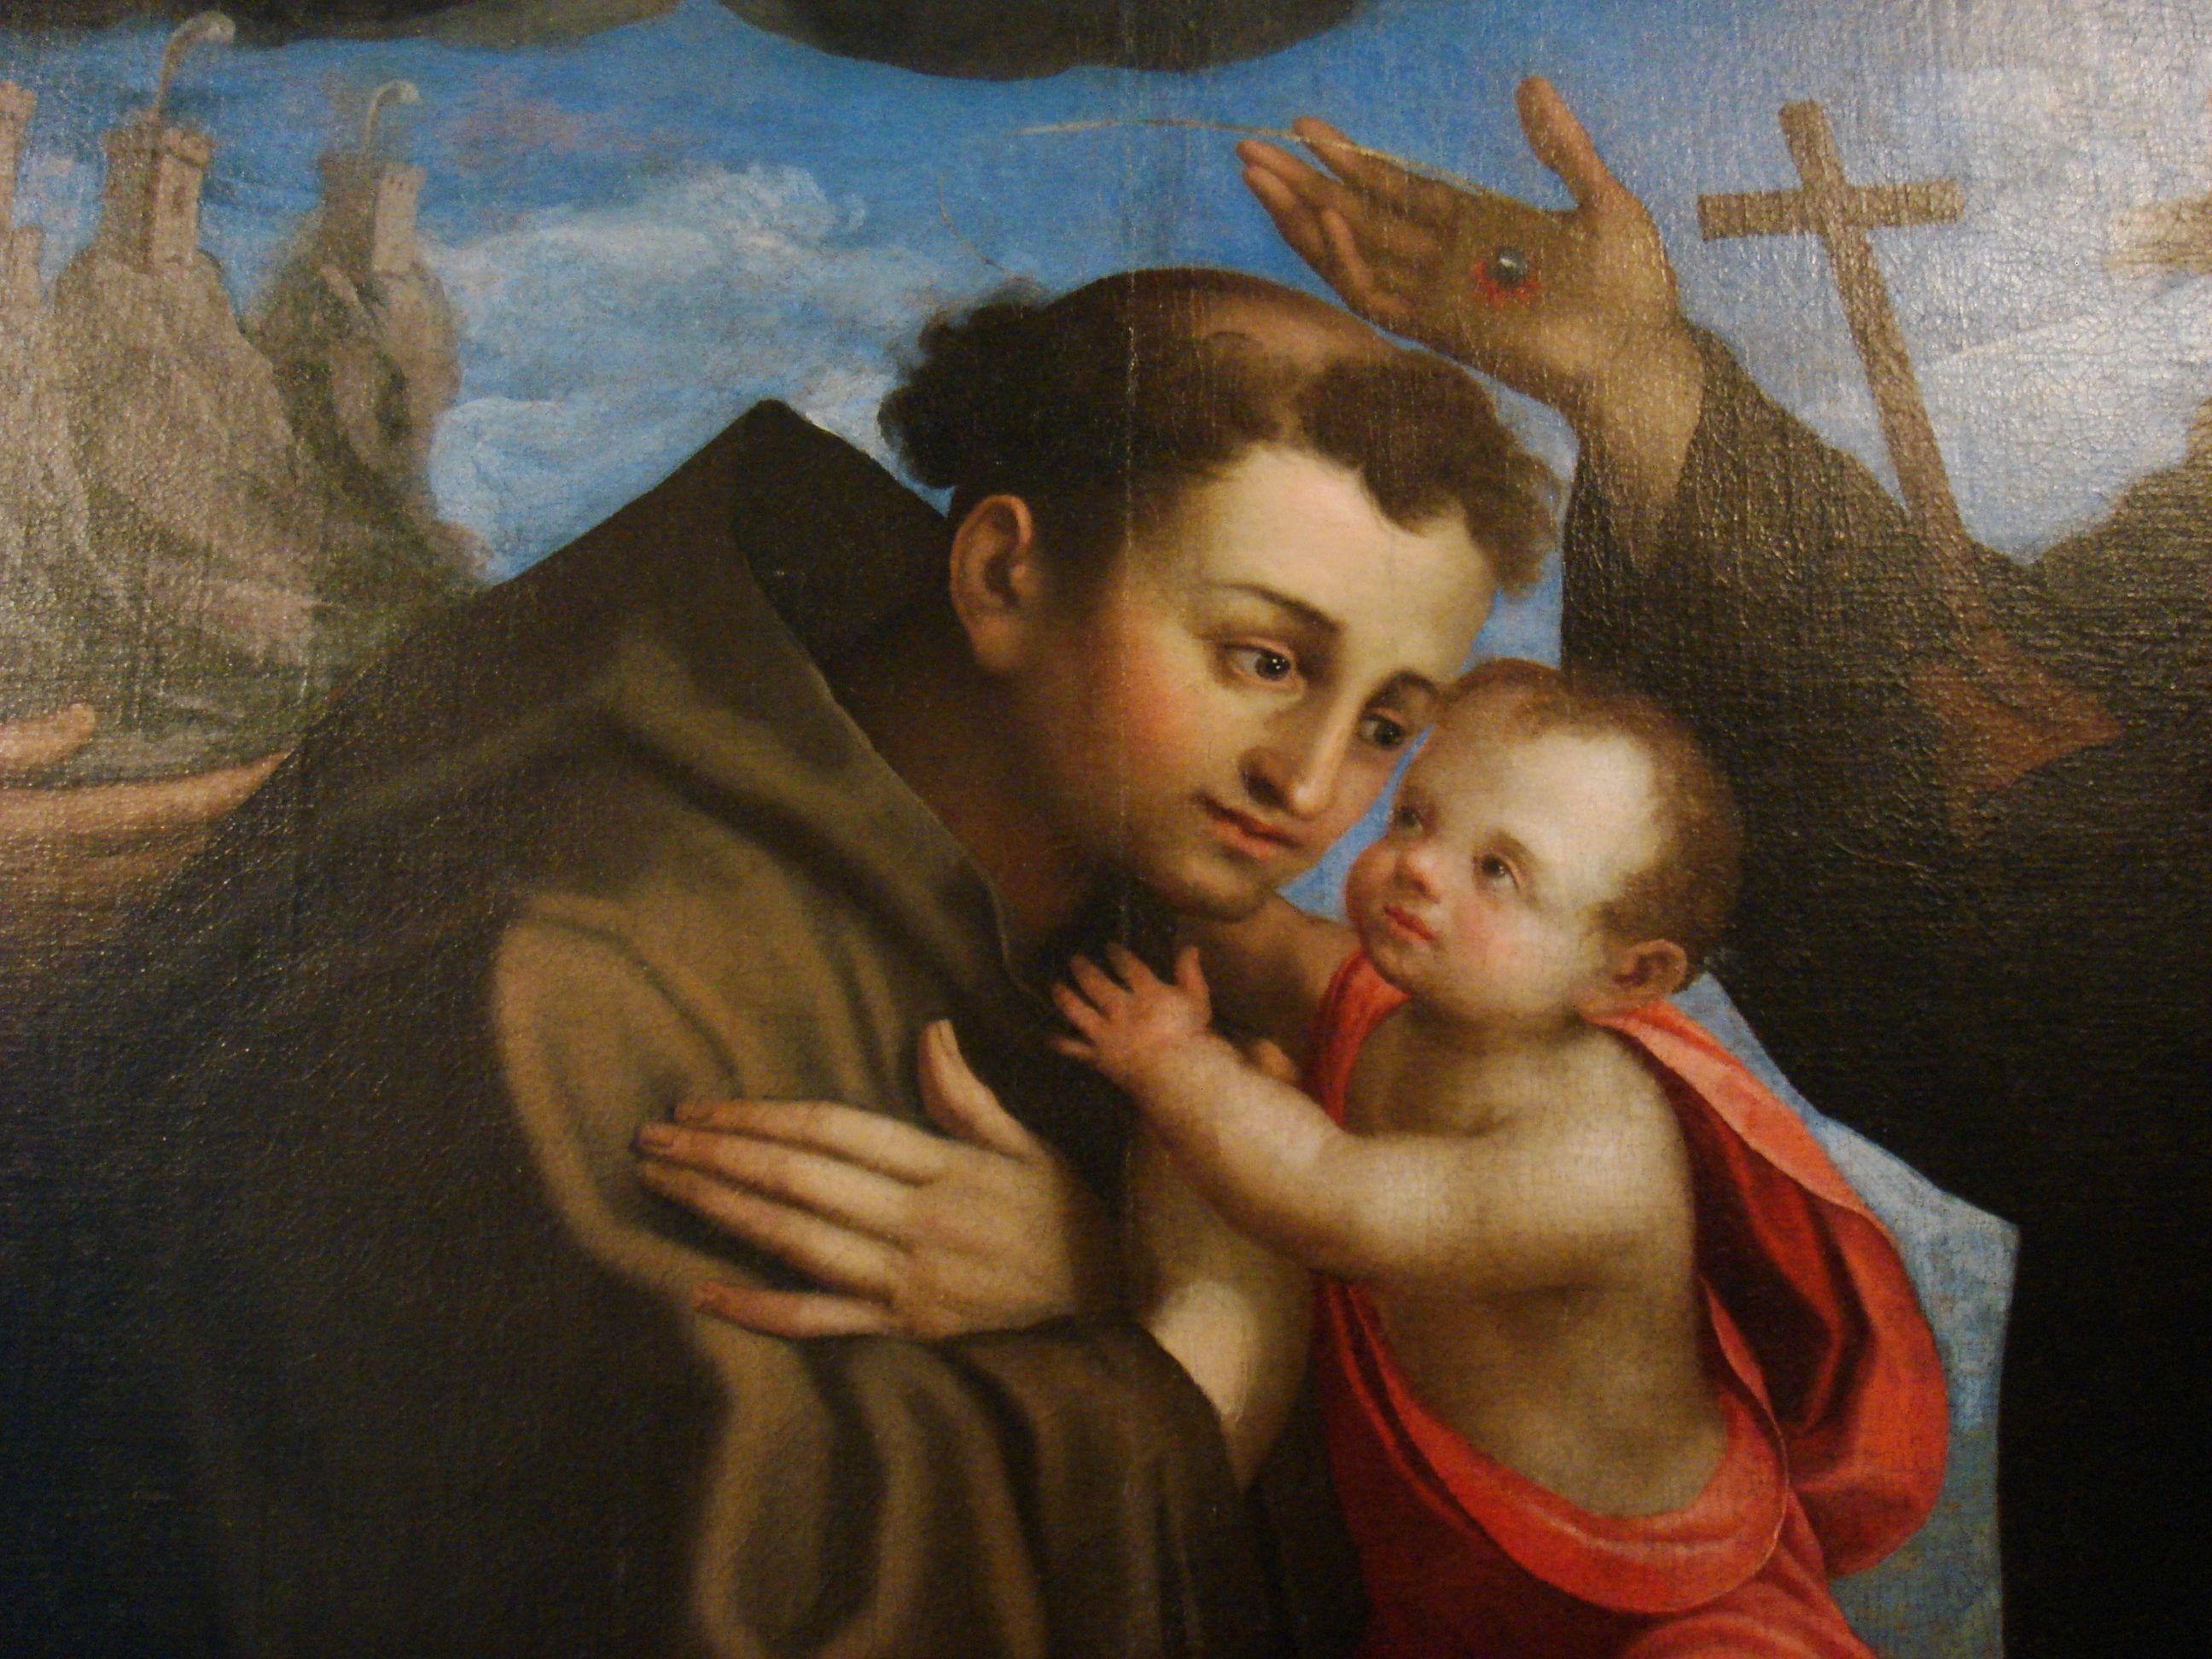 Sant'Antonio da Padova, frasi celebri e biografia